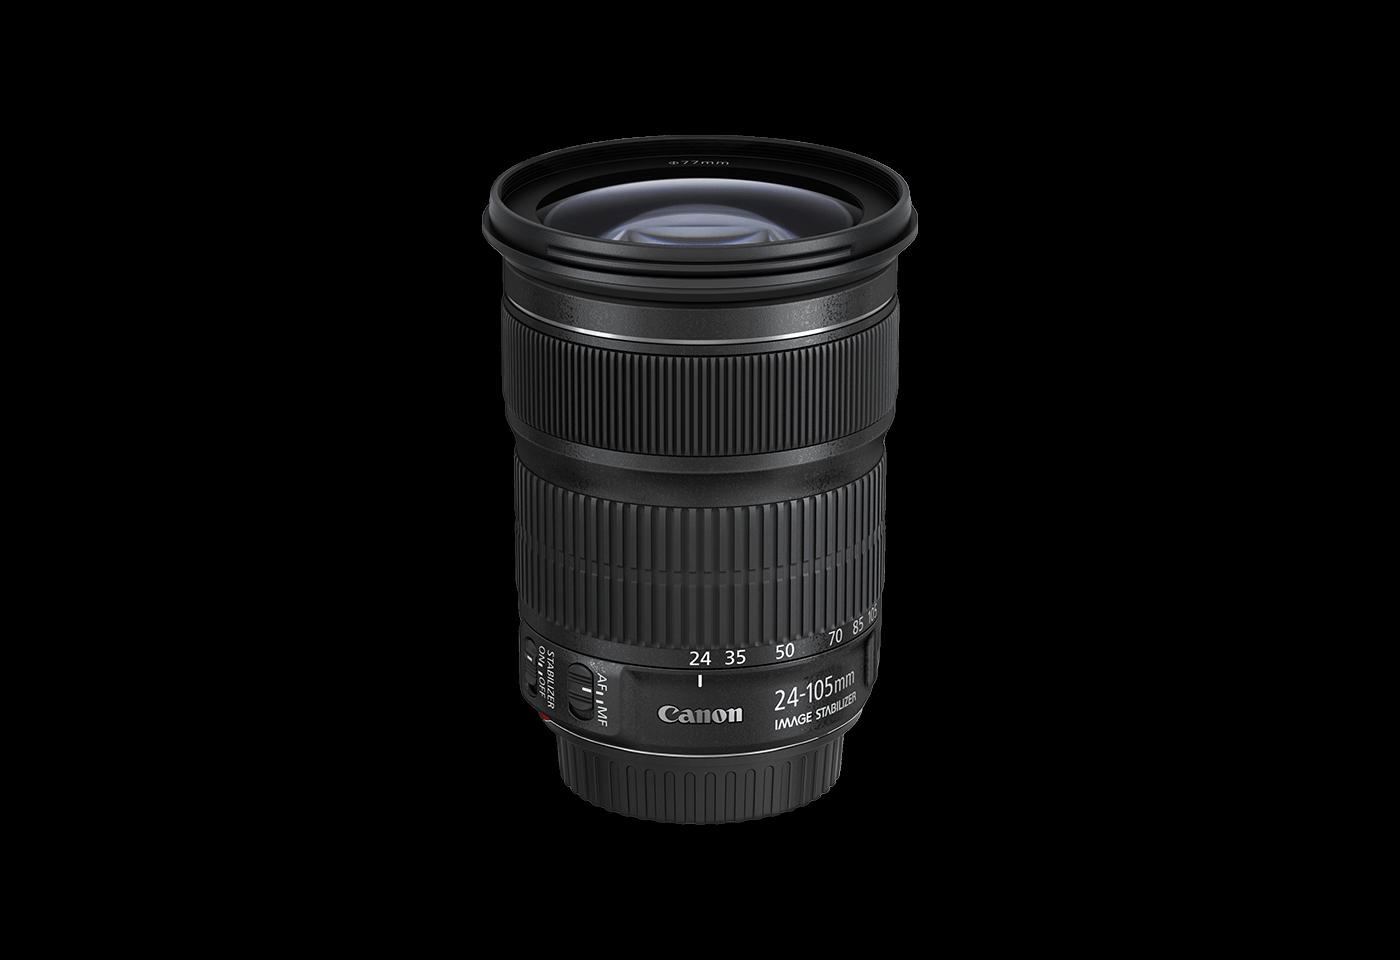 Ef 24 105mm F 3 5 5 6 Is Stm Lens Canon 24 105mm Stm Lens Canon24105 Canonstmlens Canon24105stmlens Https Www Camerasdirect Com A Canon Lens Lens Canon Ef